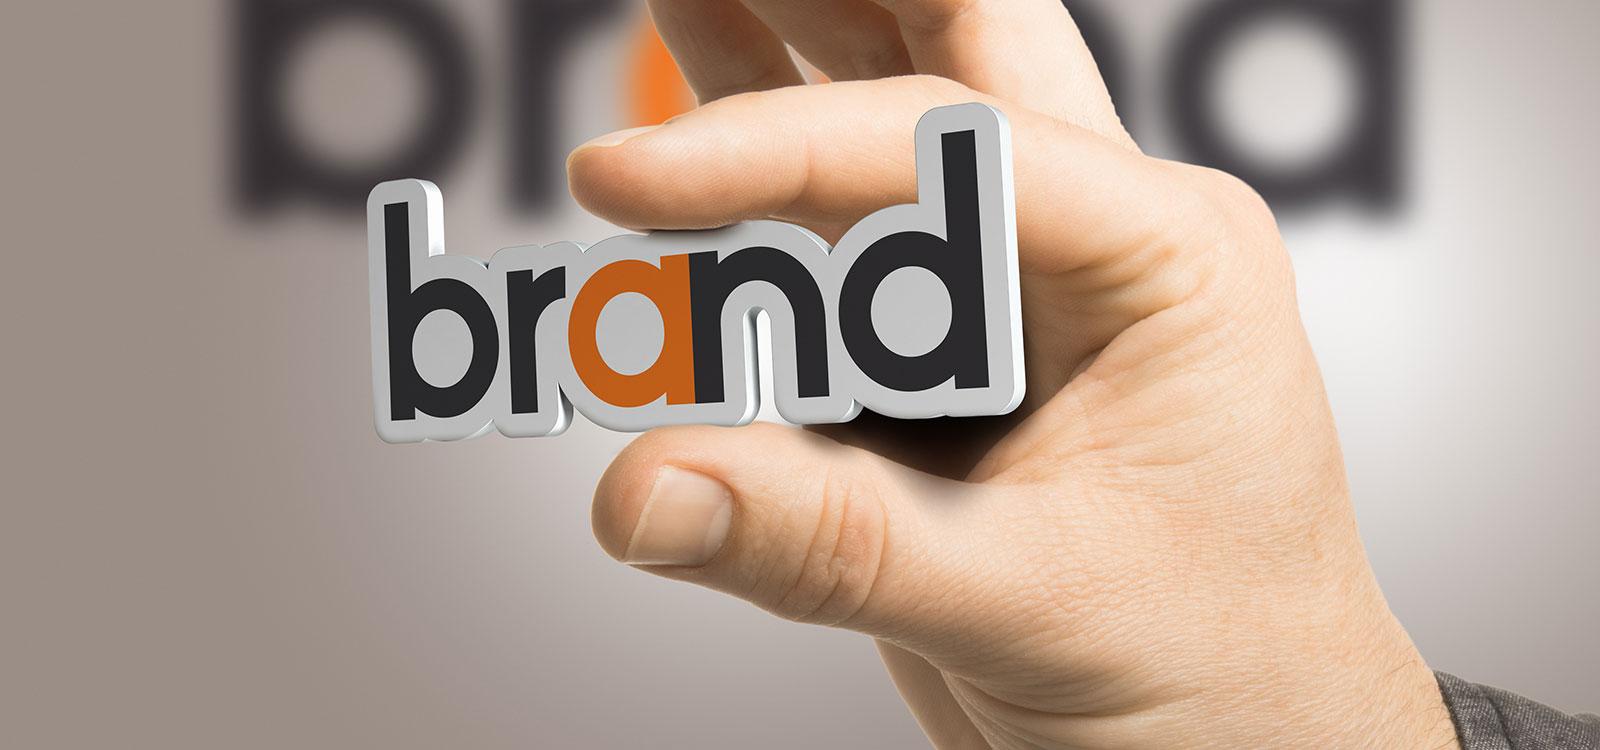 Marketing Creativo come Marketing Digitale-big